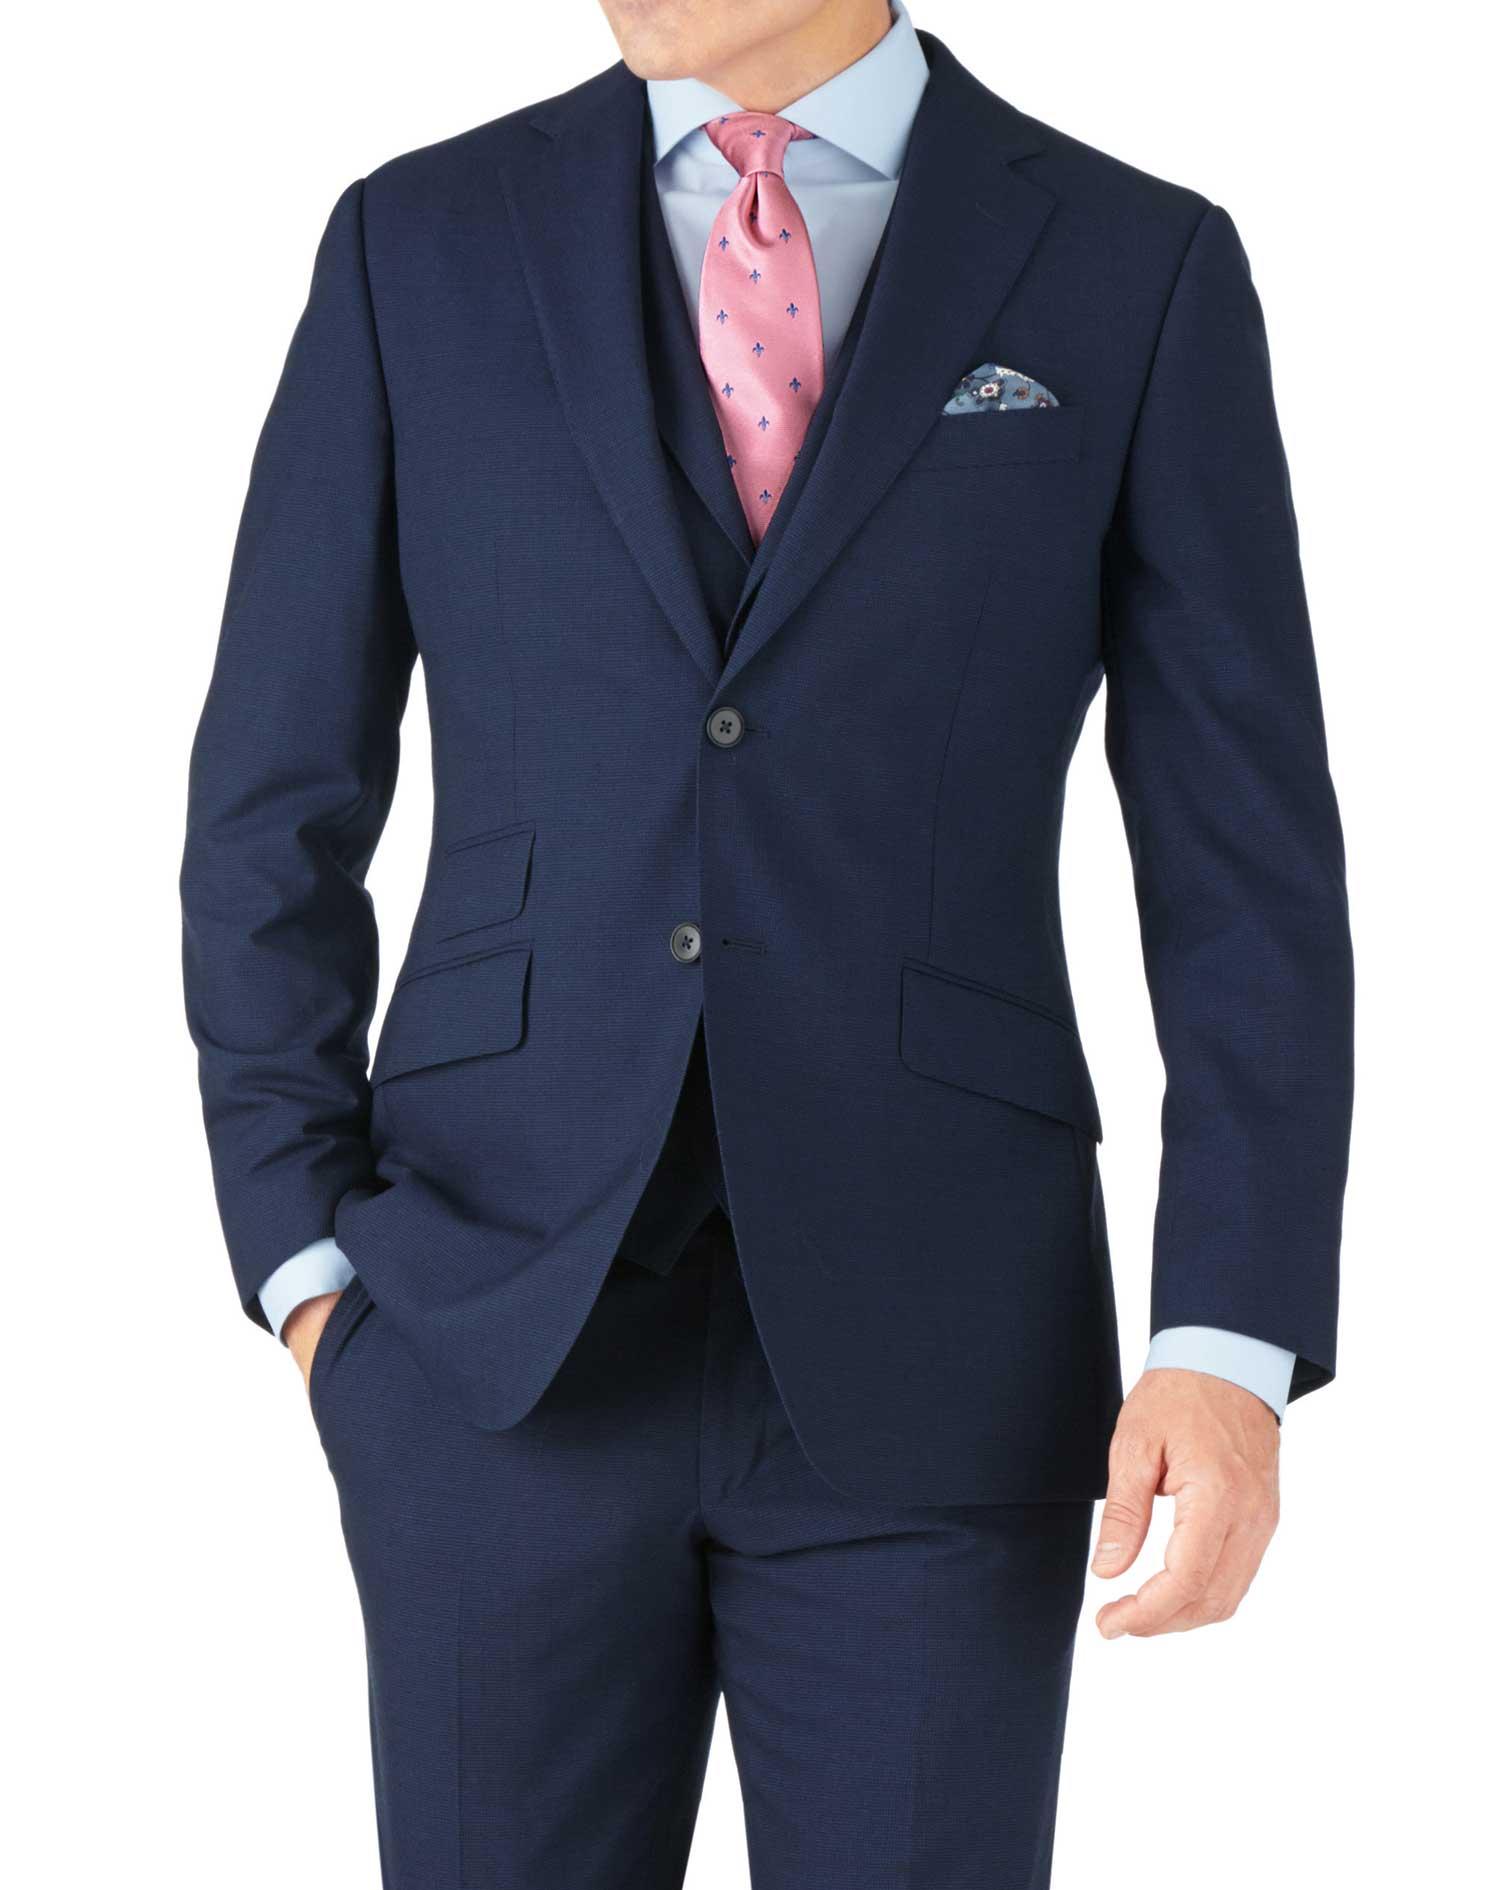 Indigo Blue Puppytooth Slim Fit Panama Business Suit Wool Jacket Size 42 Short by Charles Tyrwhitt